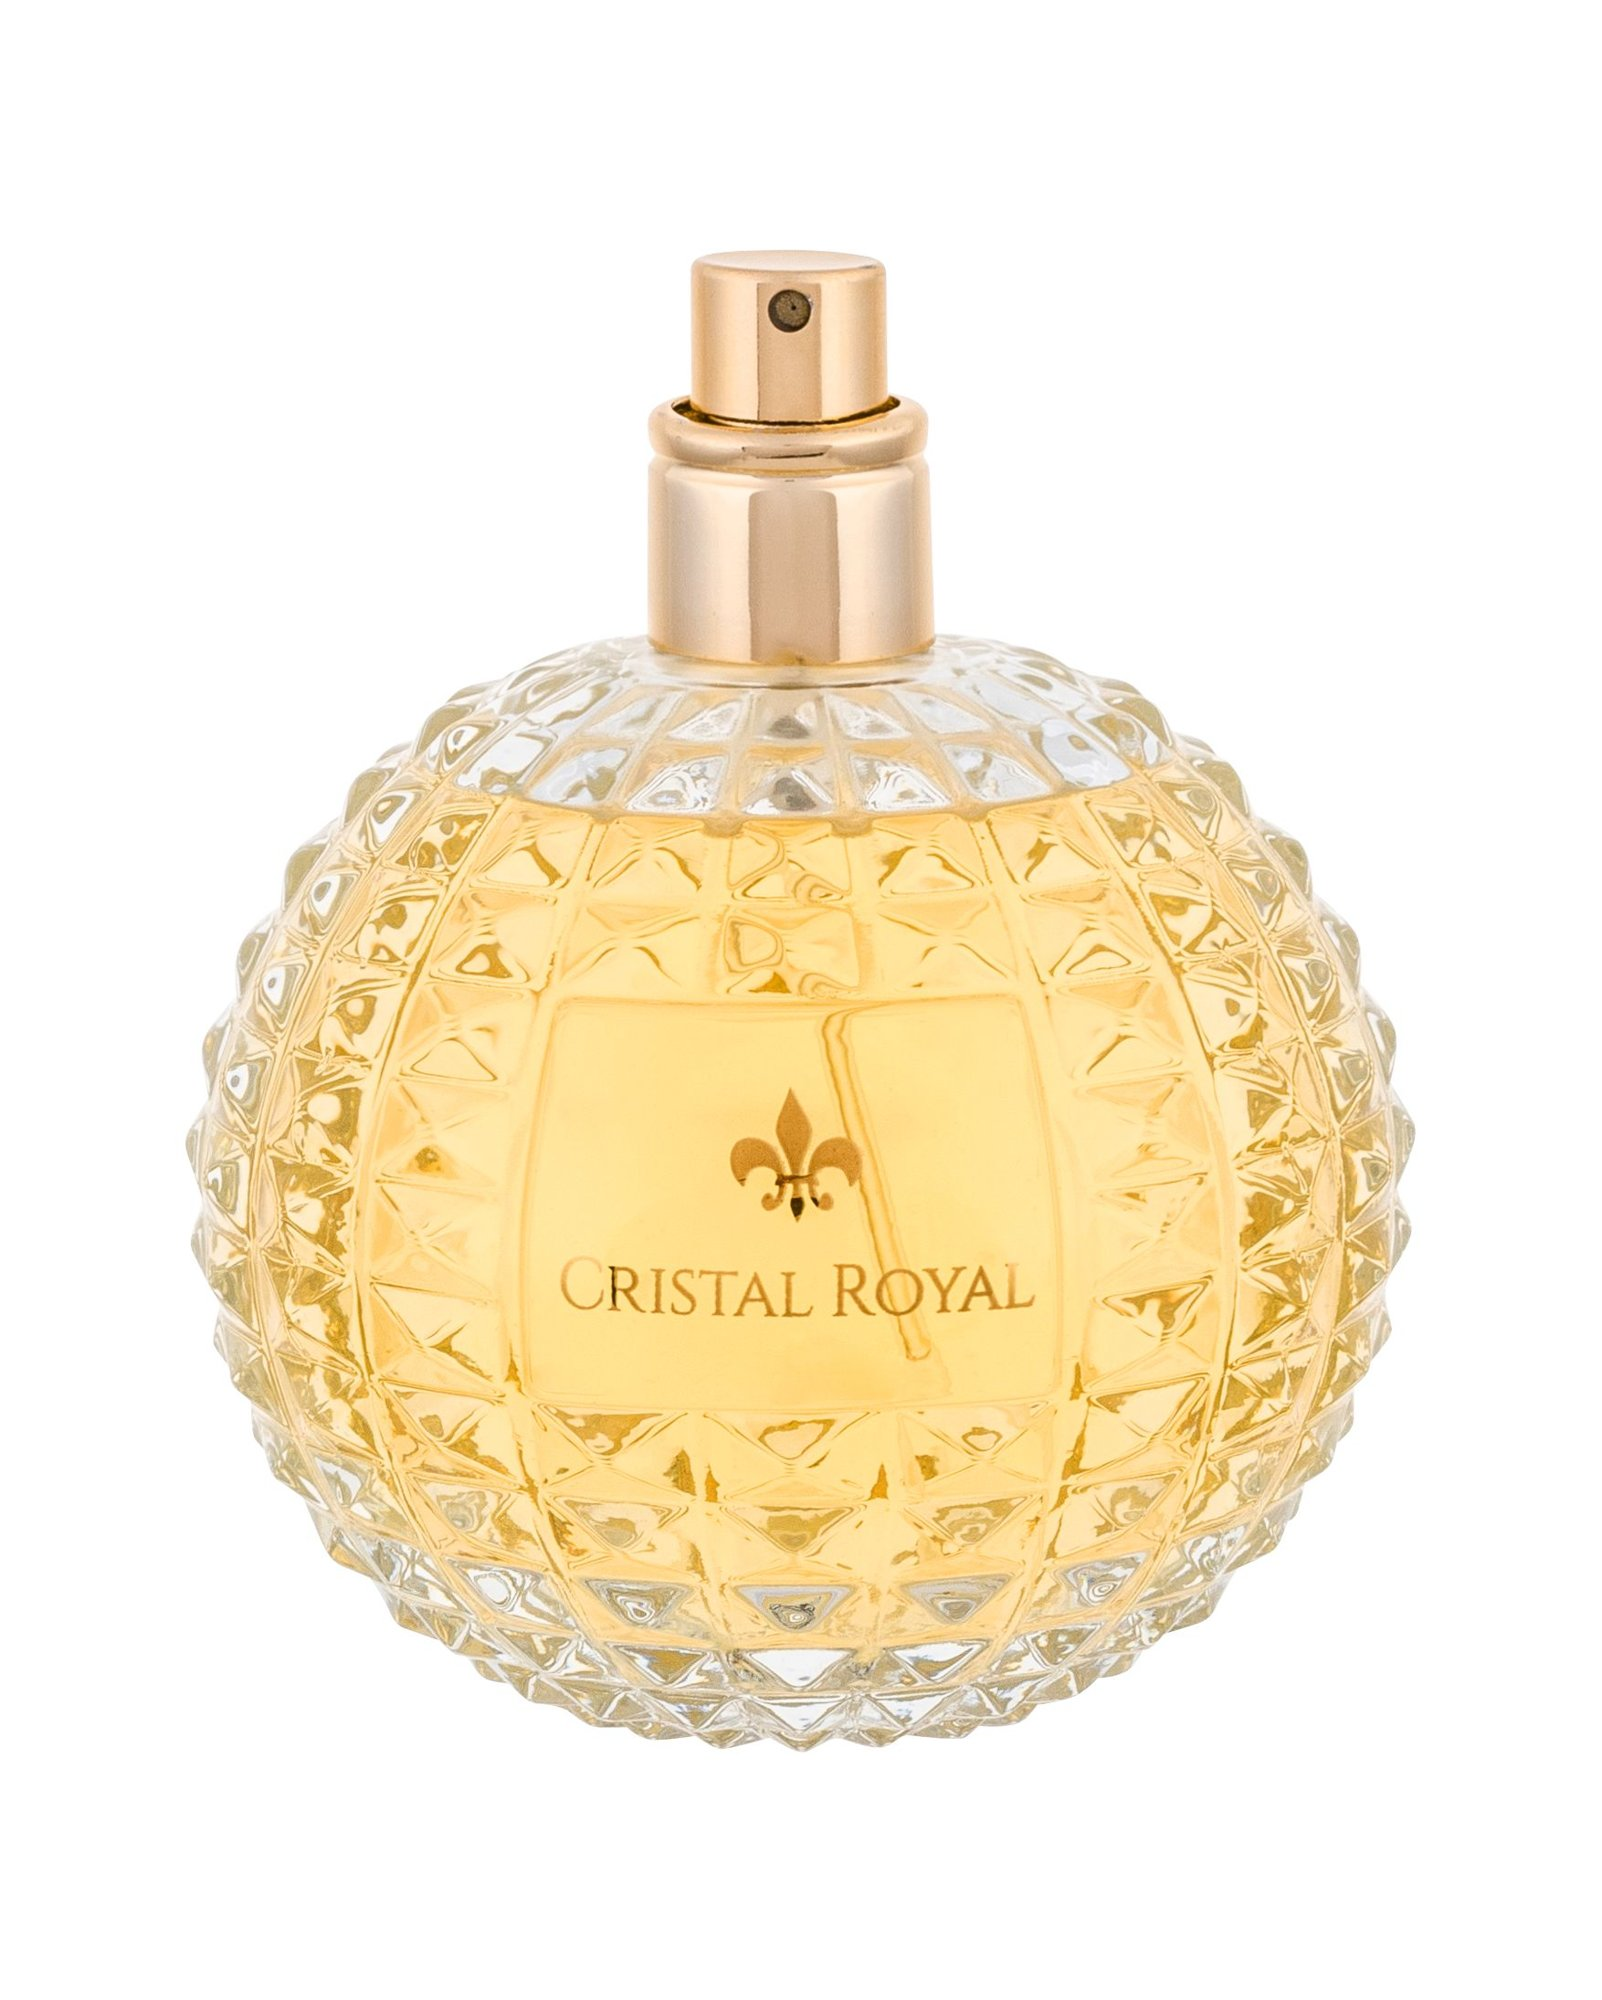 Marina de Bourbon Cristal Royal Eau de Parfum 100ml